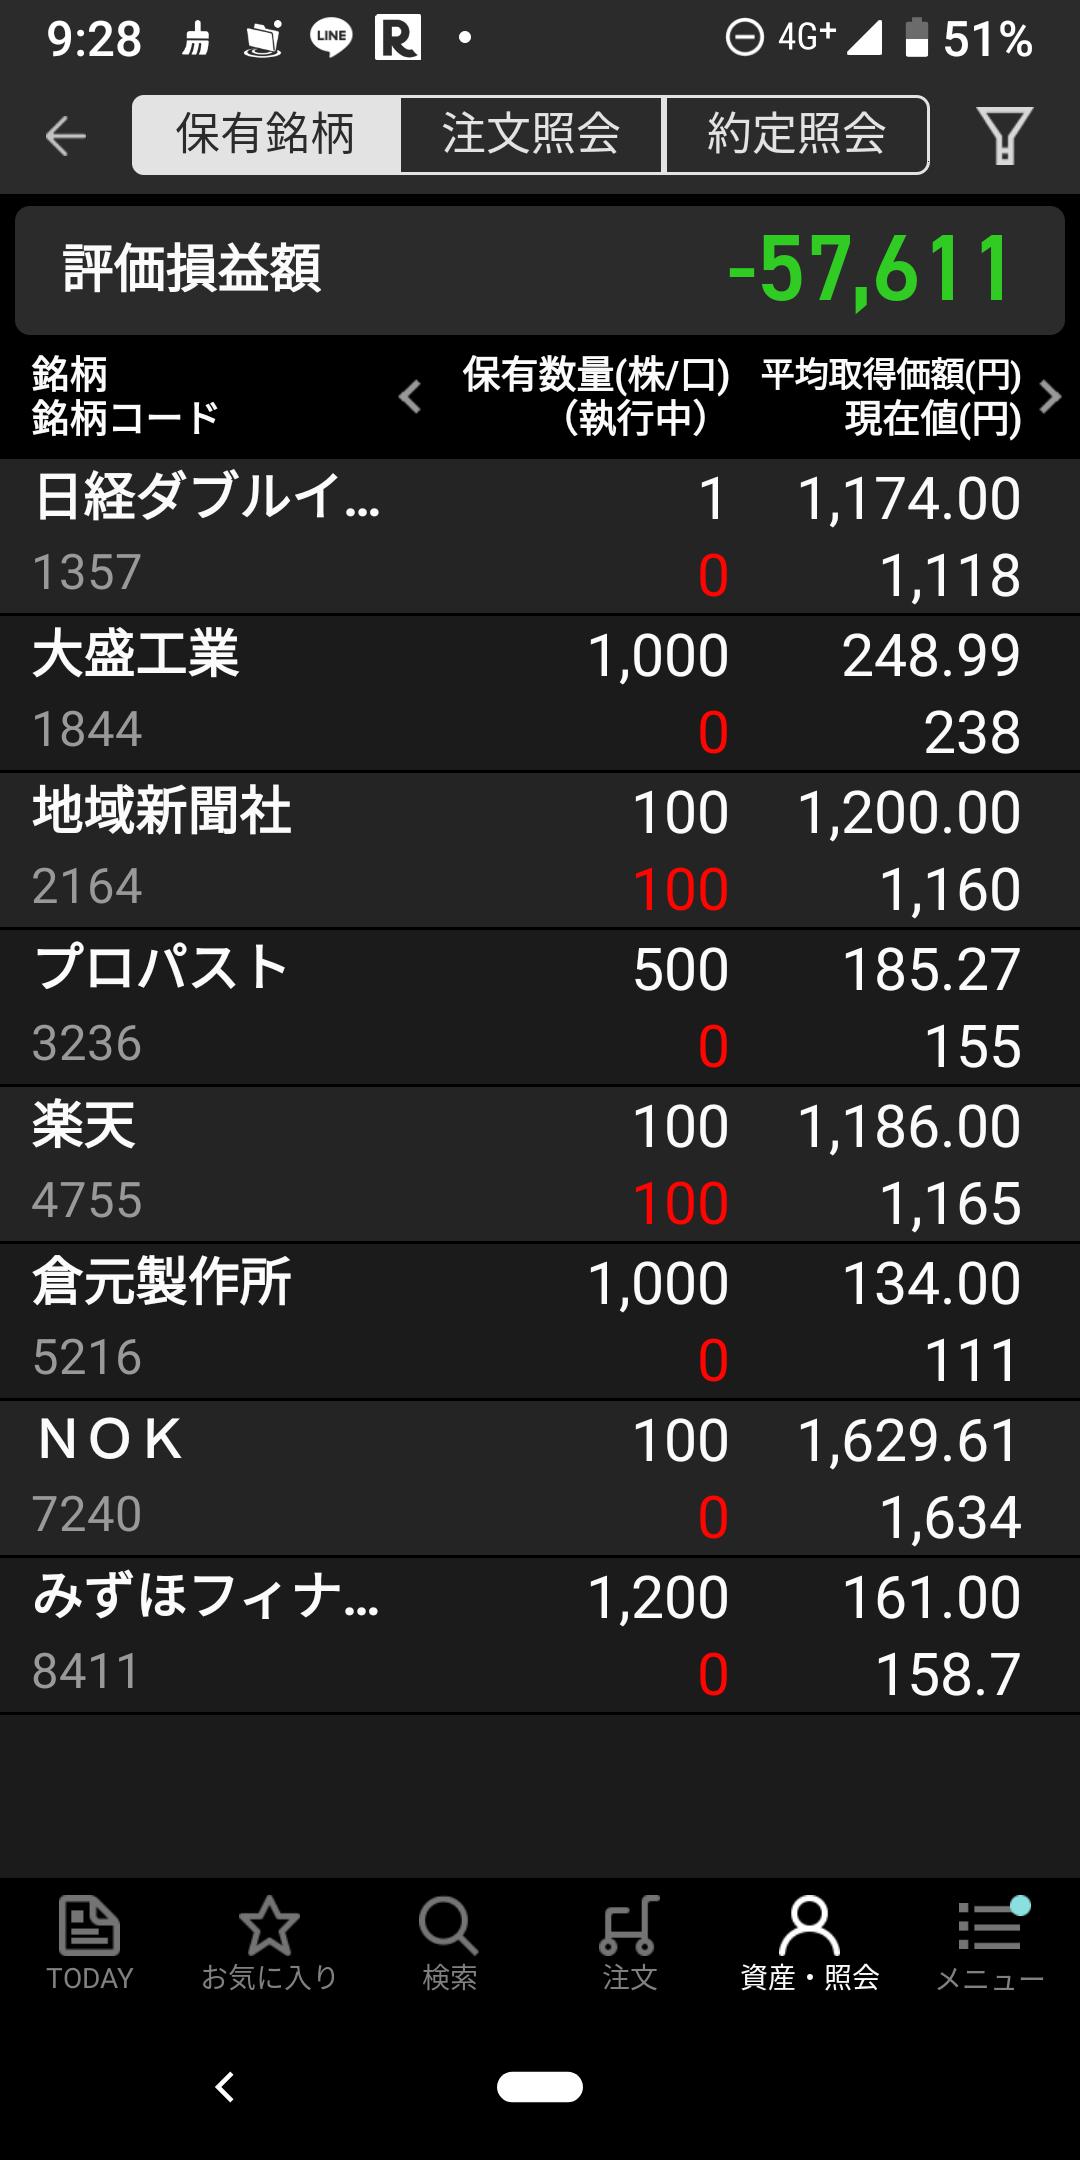 Screenshot (2019_07_12 9_28_58)